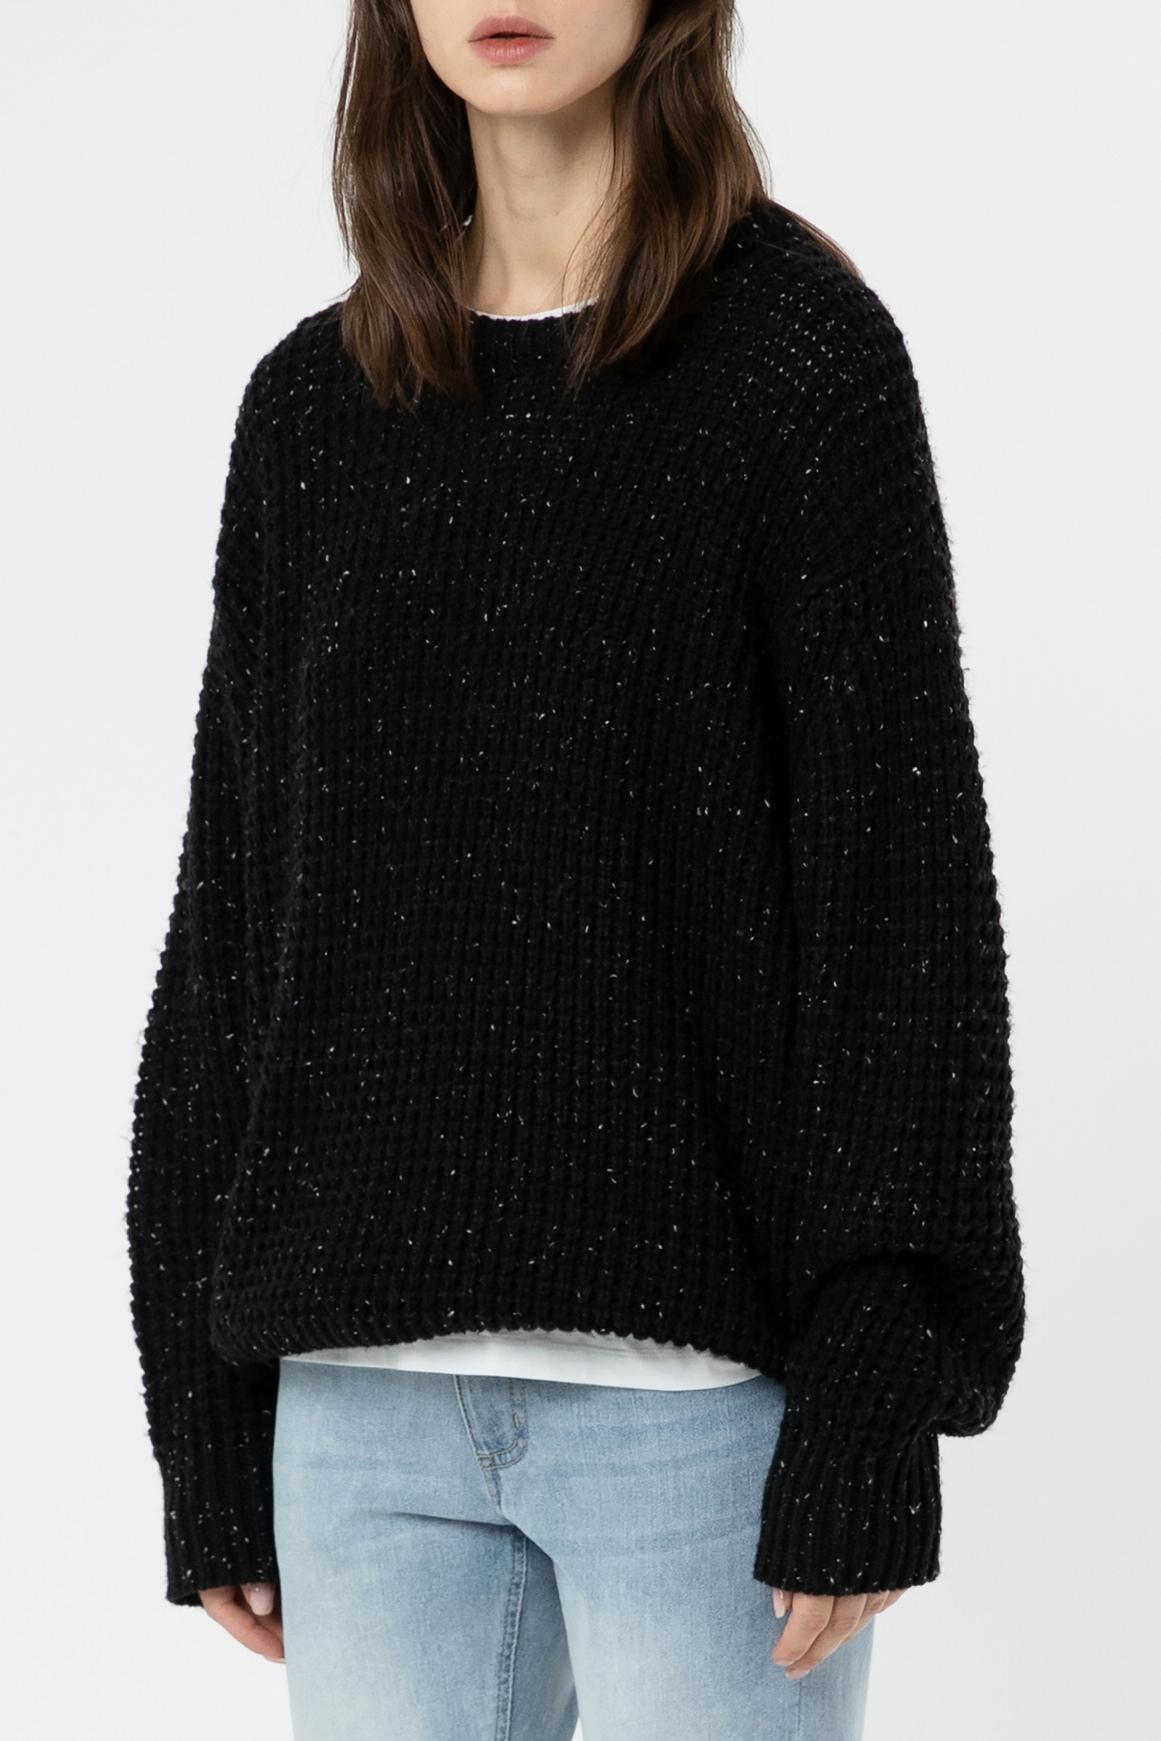 Sweater 2971 Black 4